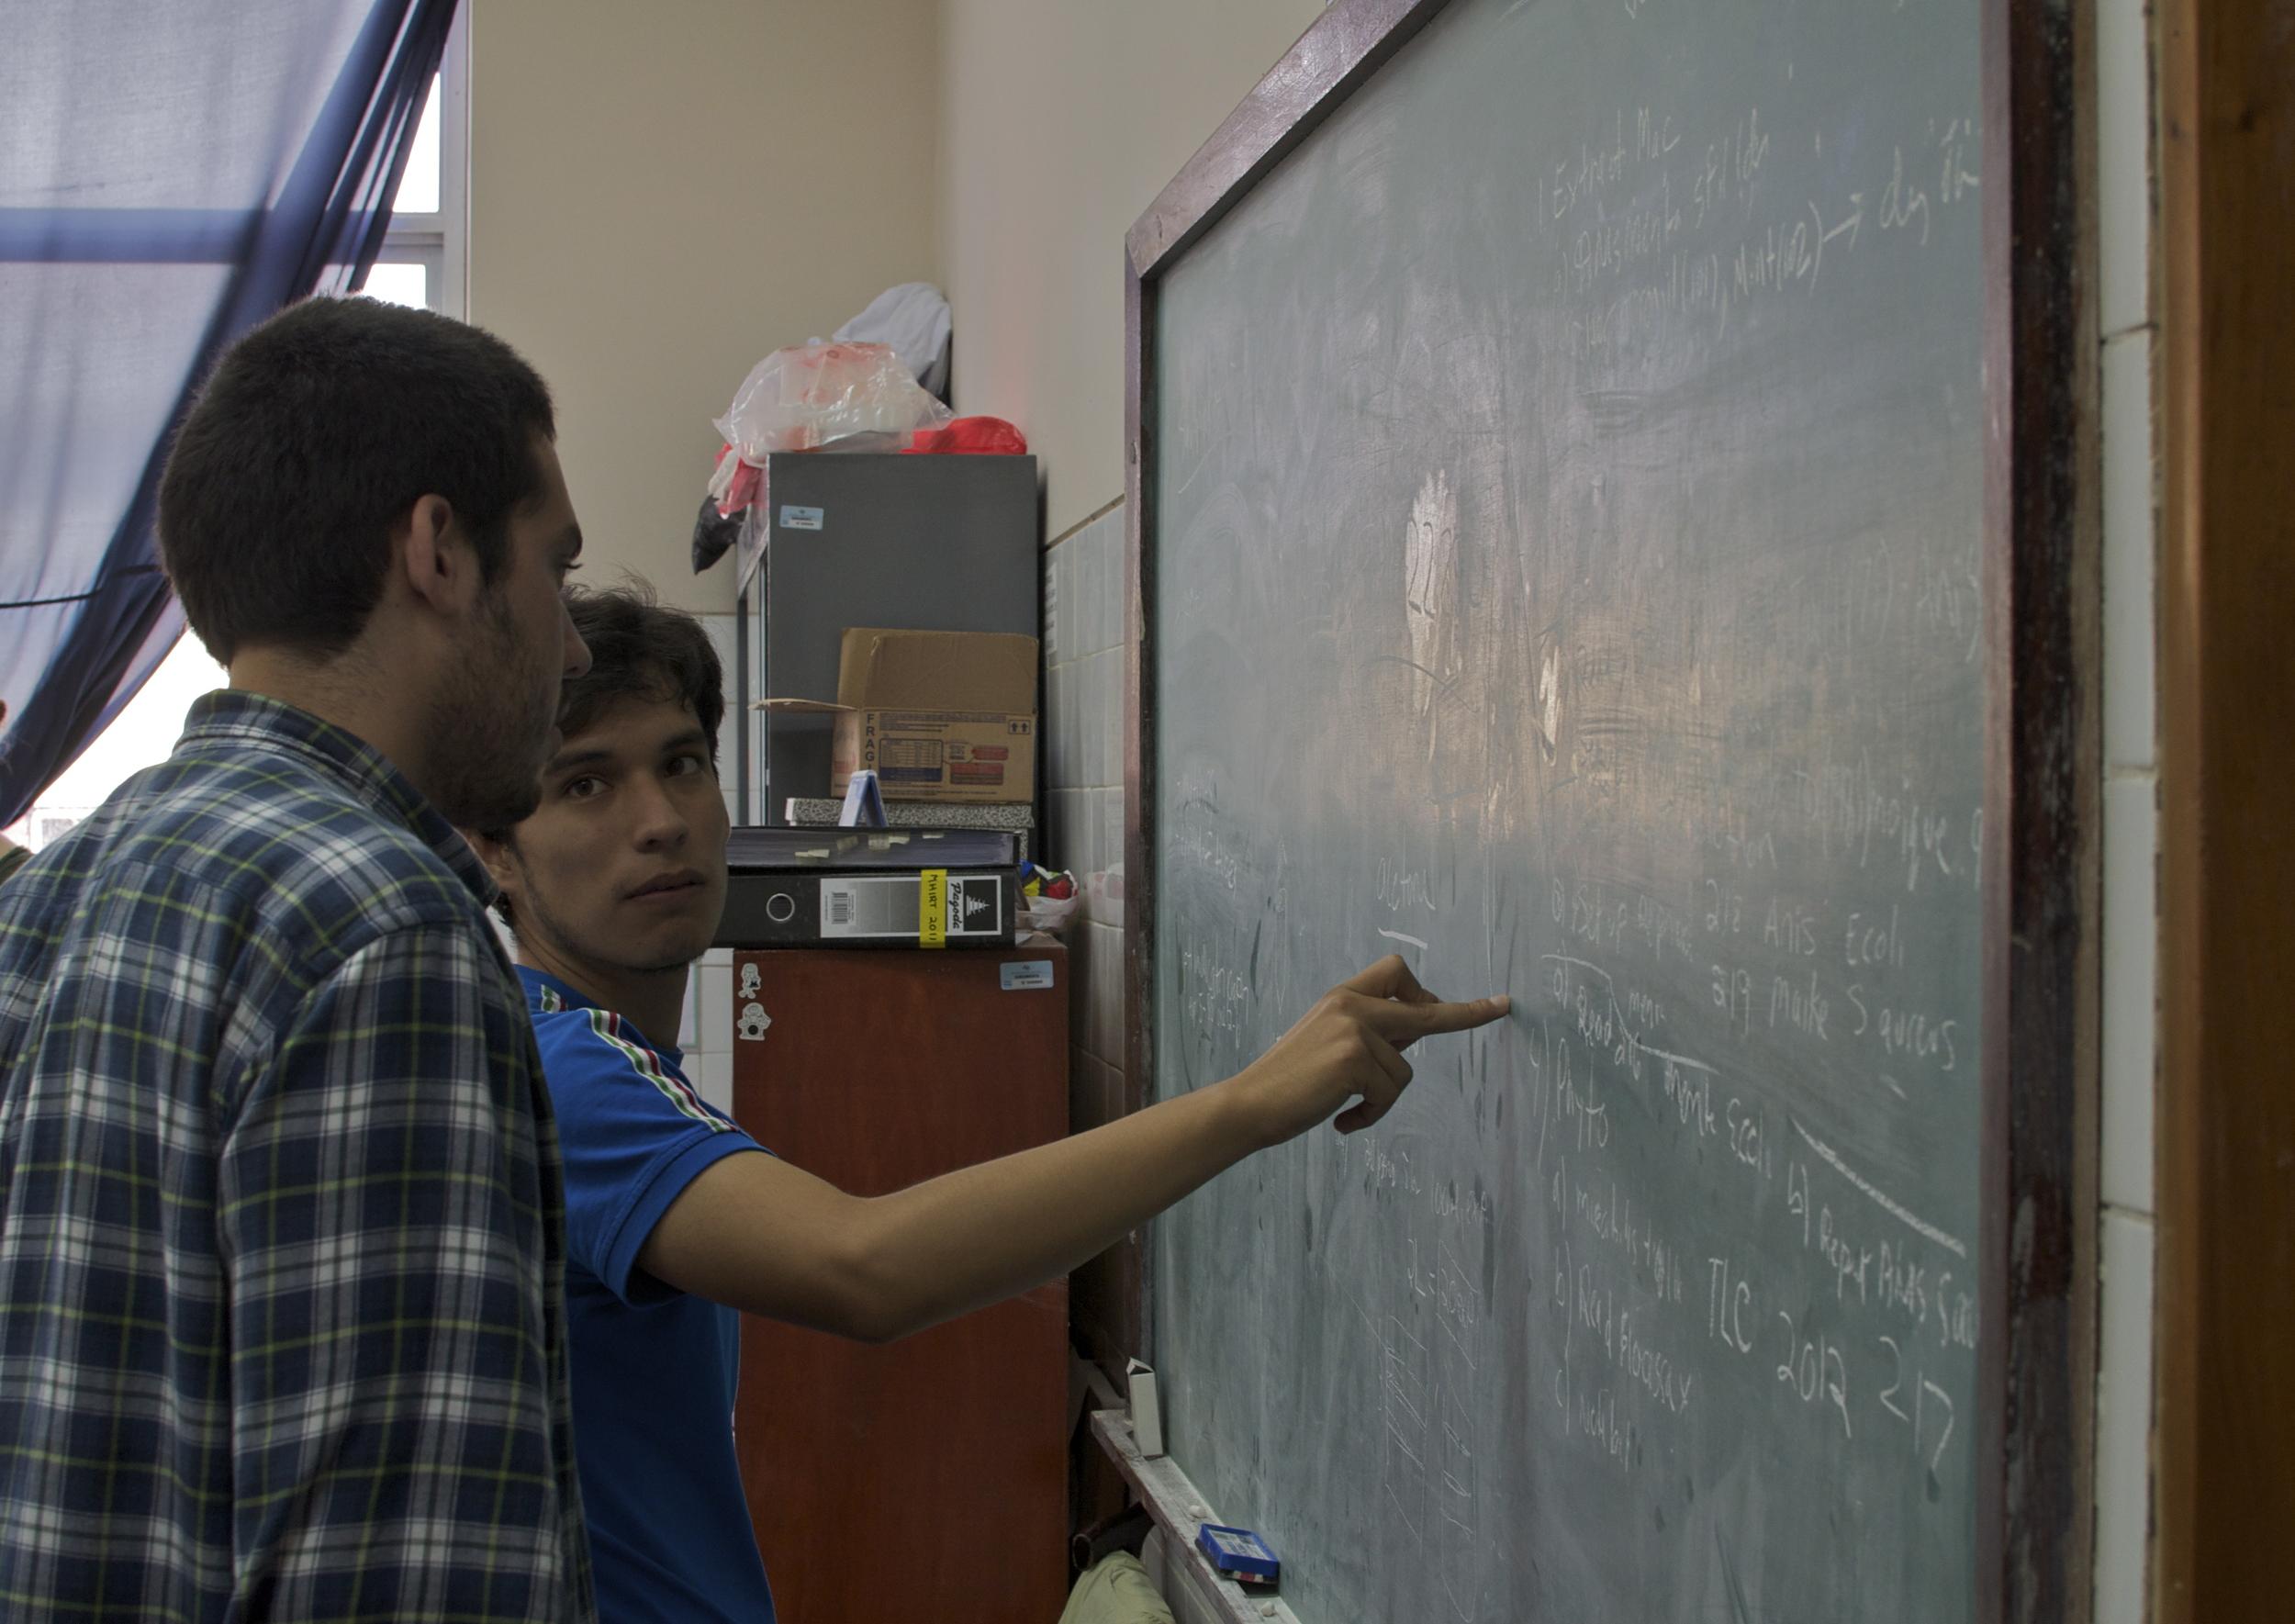 June 2014 - Alejandro Irtube aids MHIRT student Abelardo Arellano the UNT lab.